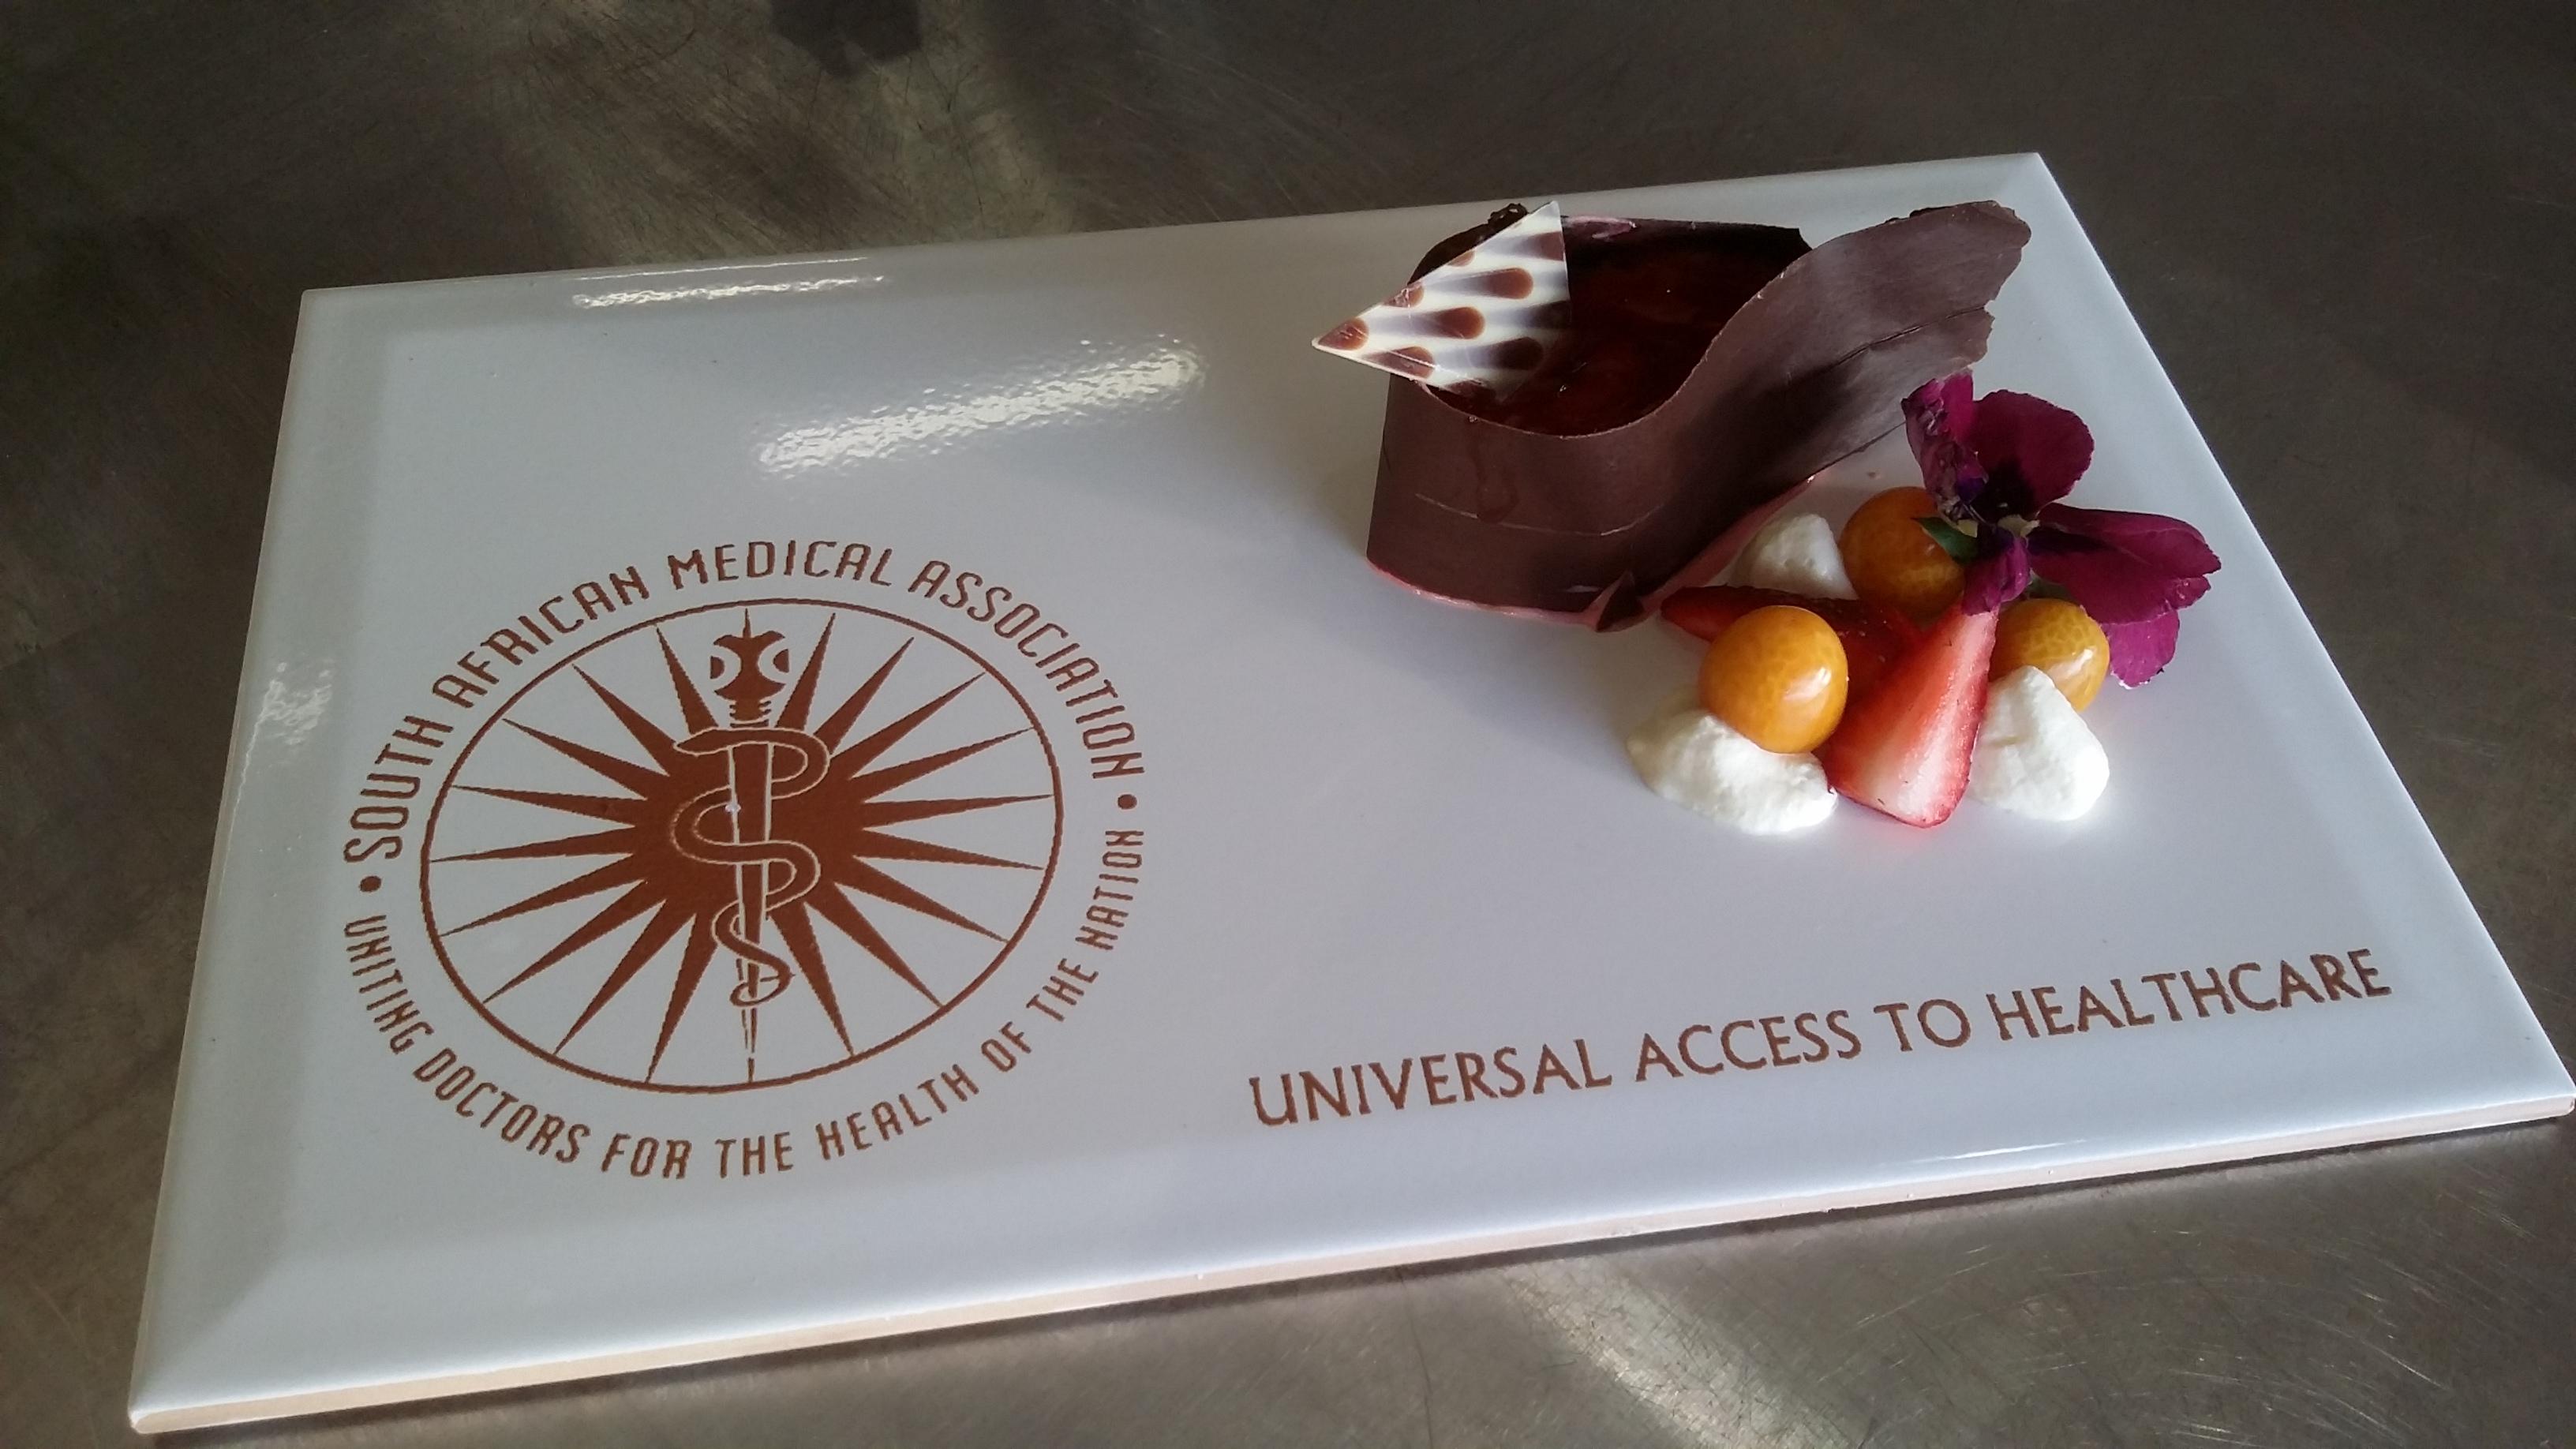 SA Medical association